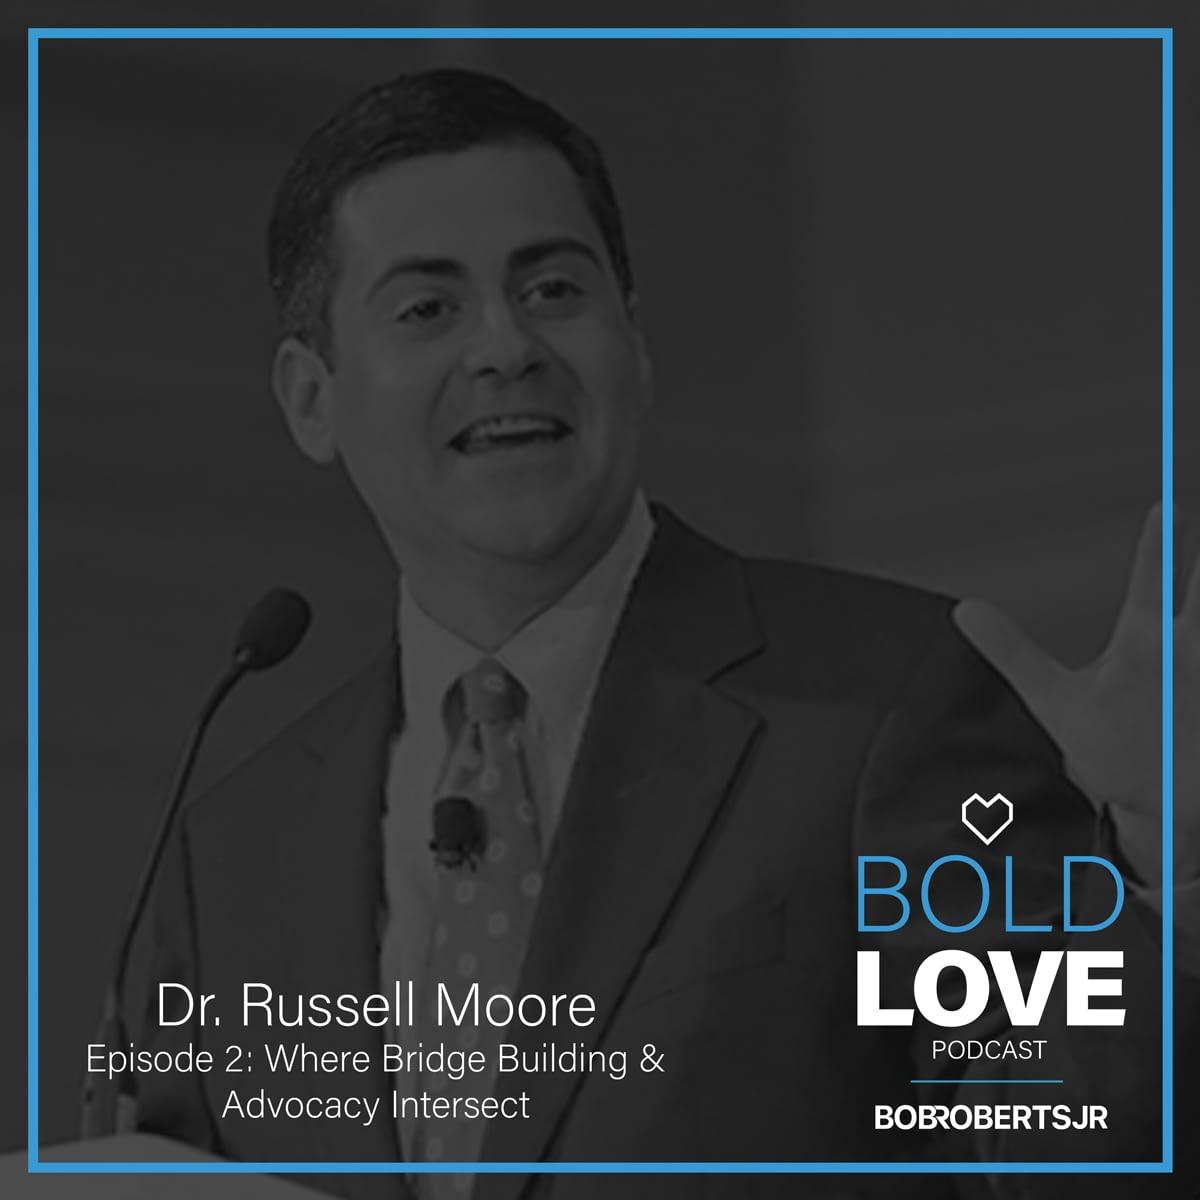 S1E2 – Dr. Russell Moore | Where Bridge Building & Advocacy Intersect